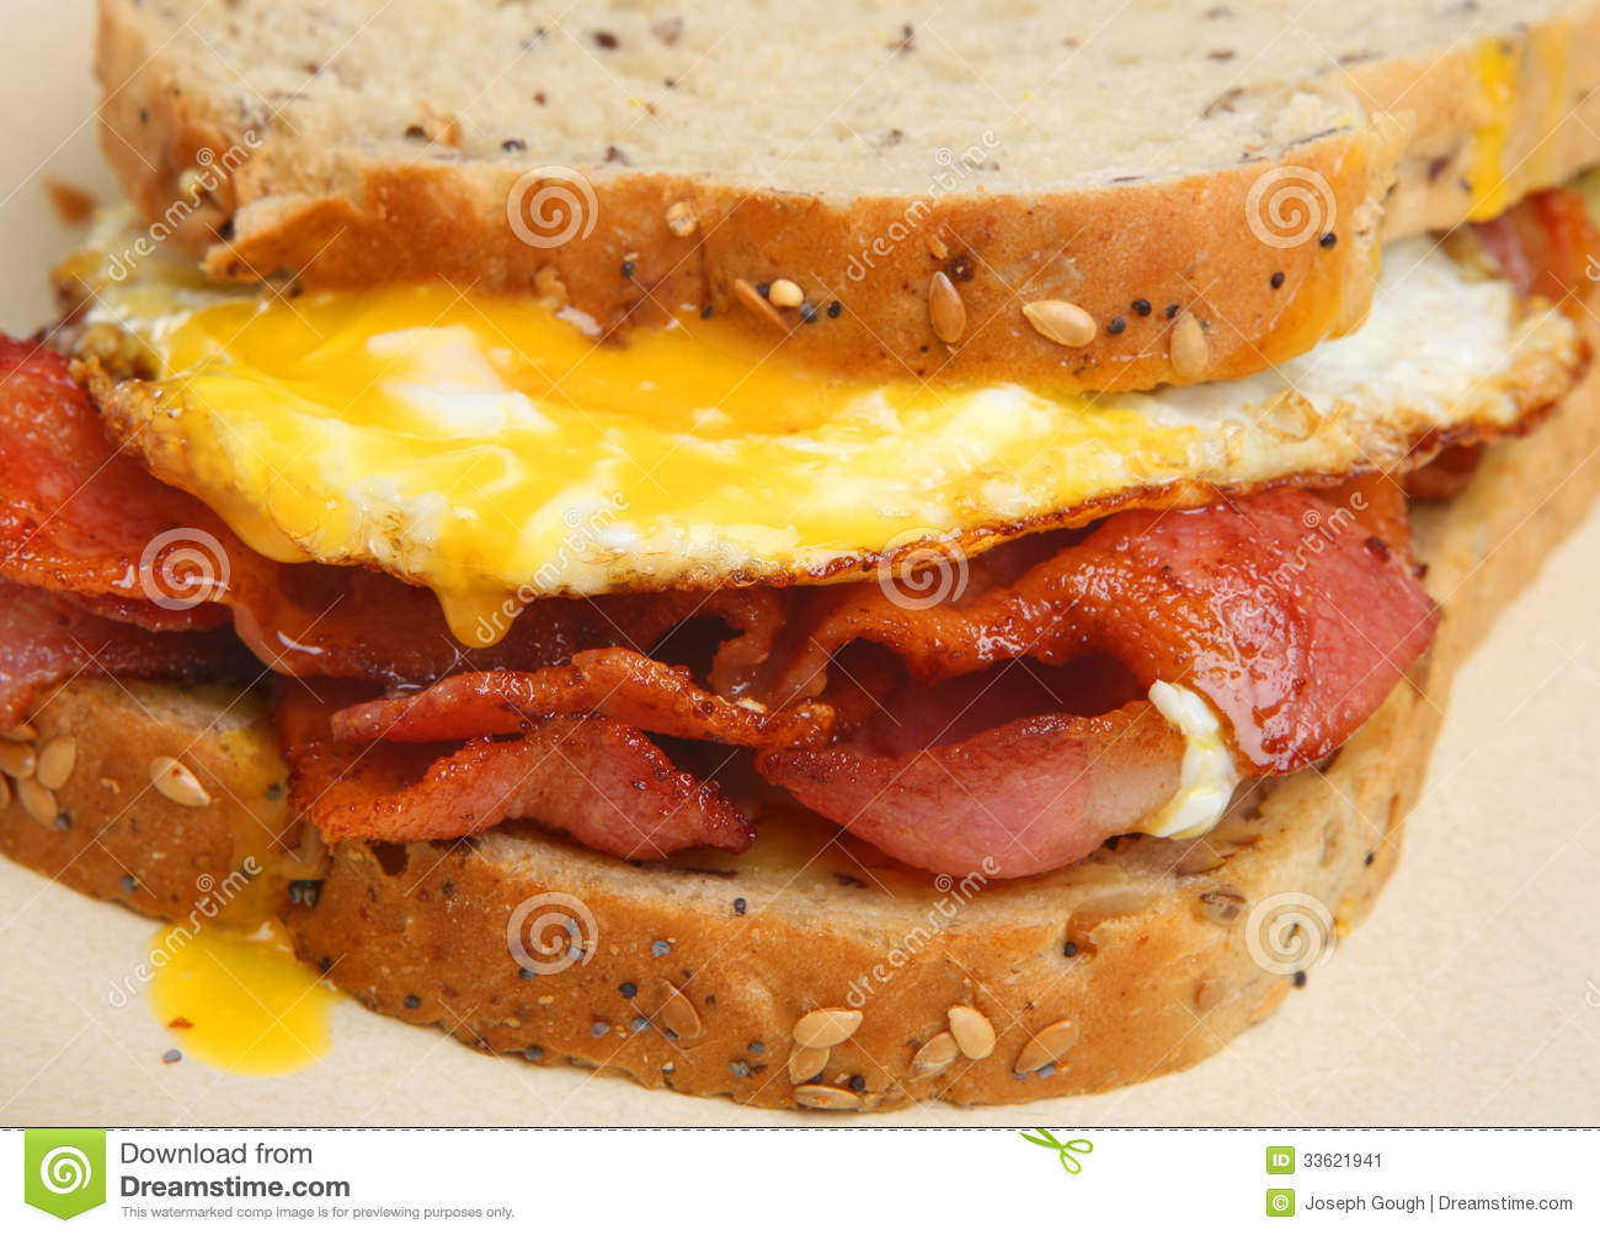 Bacon & Egg Sandwich Stock Image - Image: 33621941